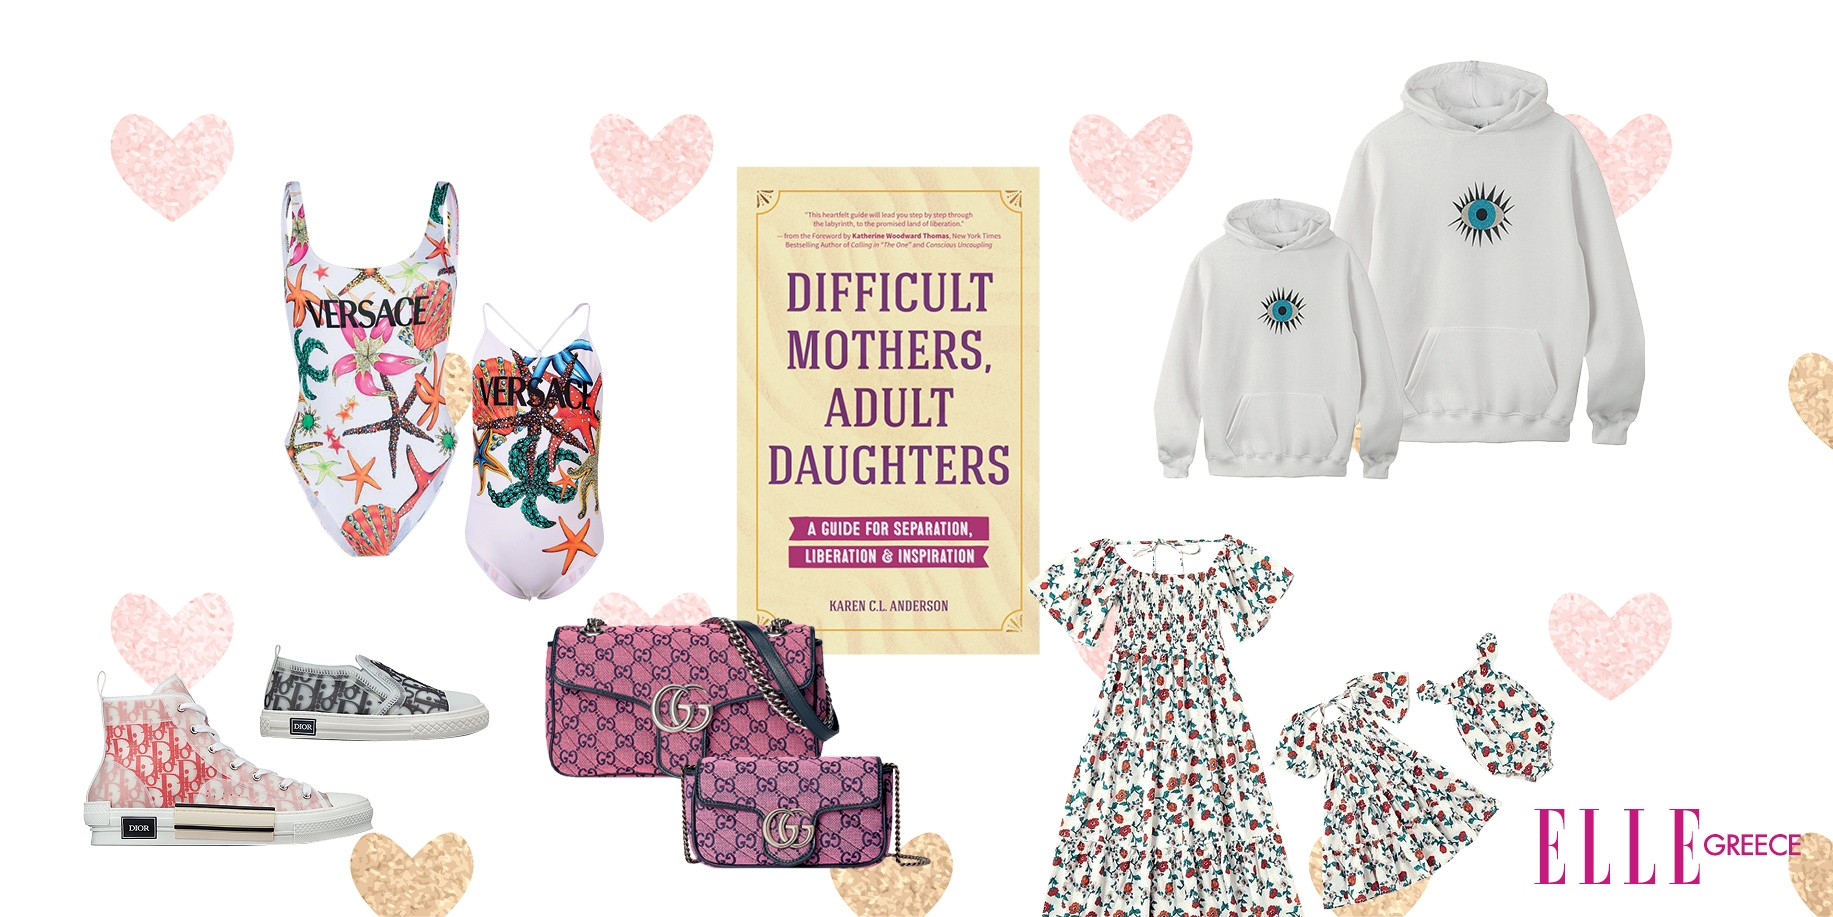 Elena's Choice: Τα αγαπημένα του Μαΐου Η εκδότρια του ELLE, Έλενα Μακρή, επιλέγει τα ρούχα, τα αξεσουάρ, τα beauty items και ό,τι άλλο της τράβηξε την προσοχή αυτό το μήνα.